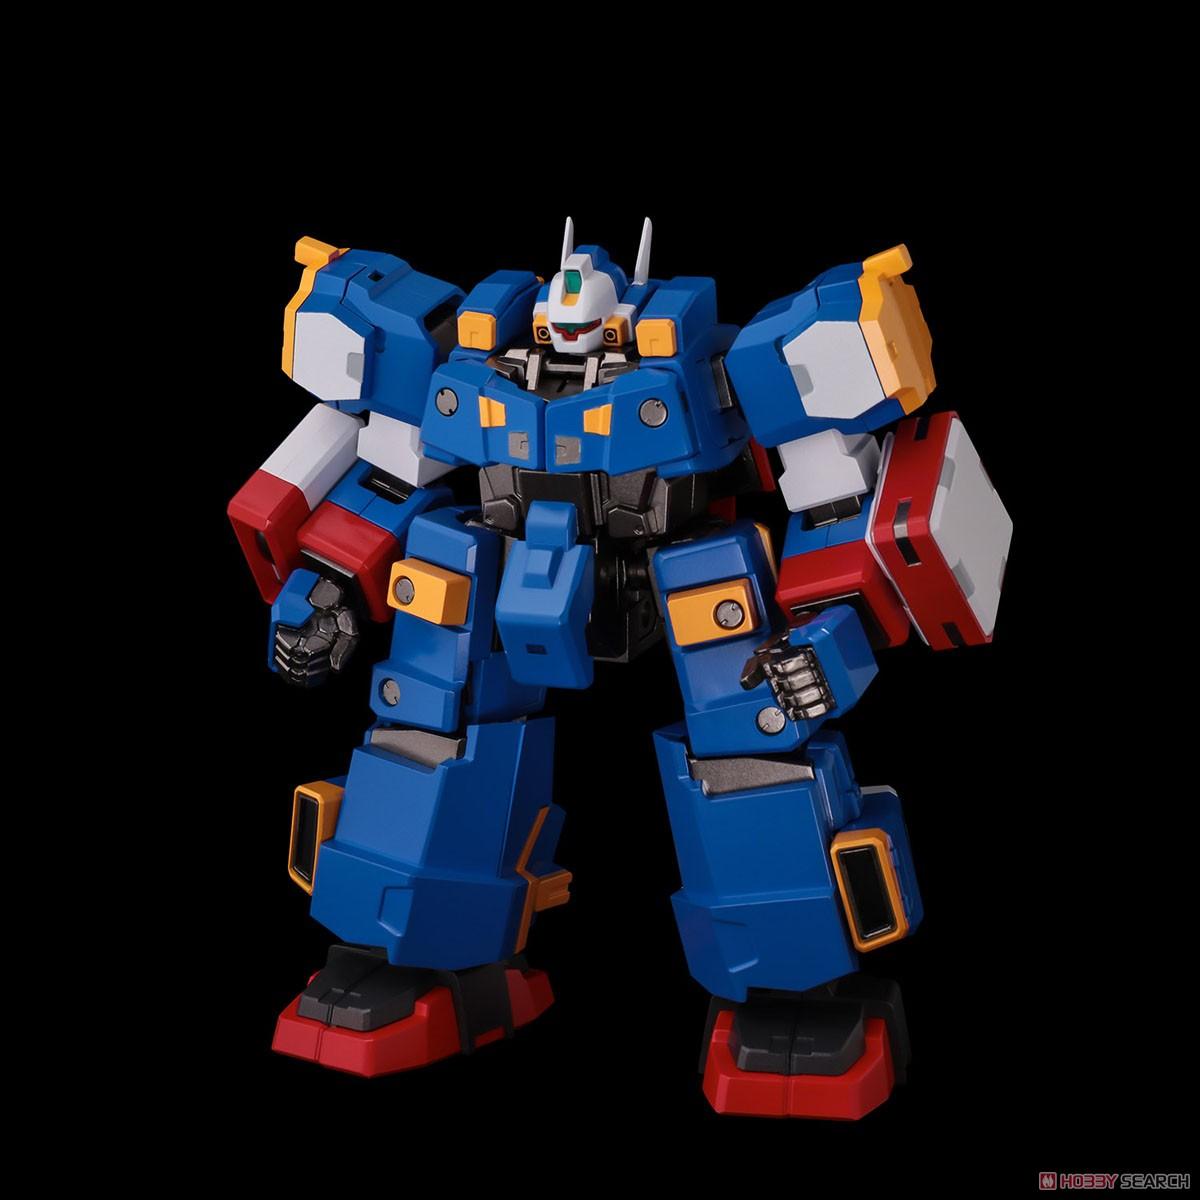 RIOBOT『変形合体 R-1』スーパーロボット大戦OG 可変合体フィギュア-023